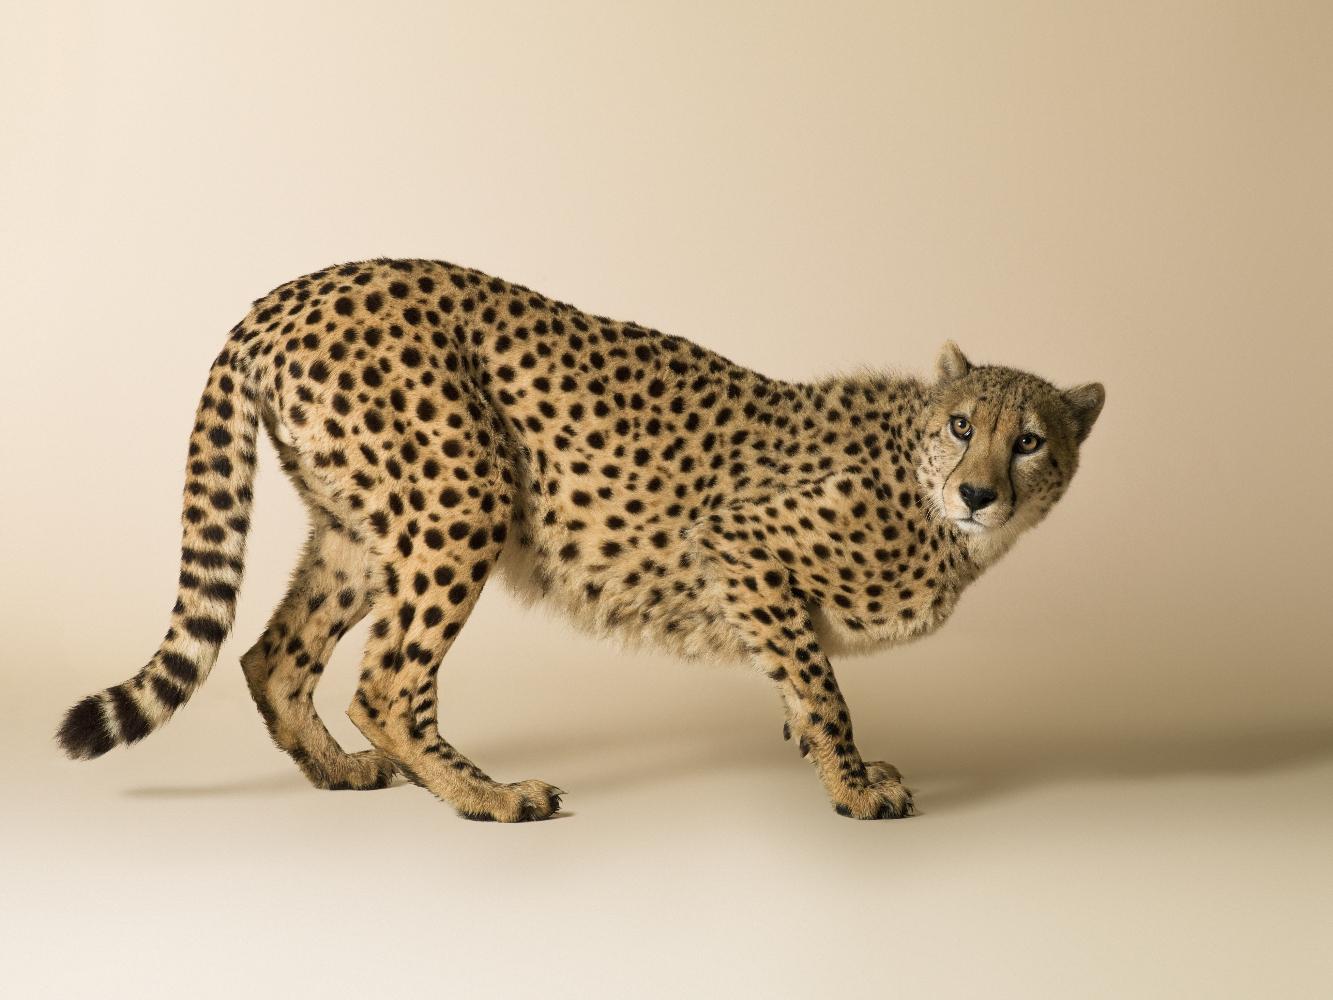 Dominic Marley Cheetah portrait